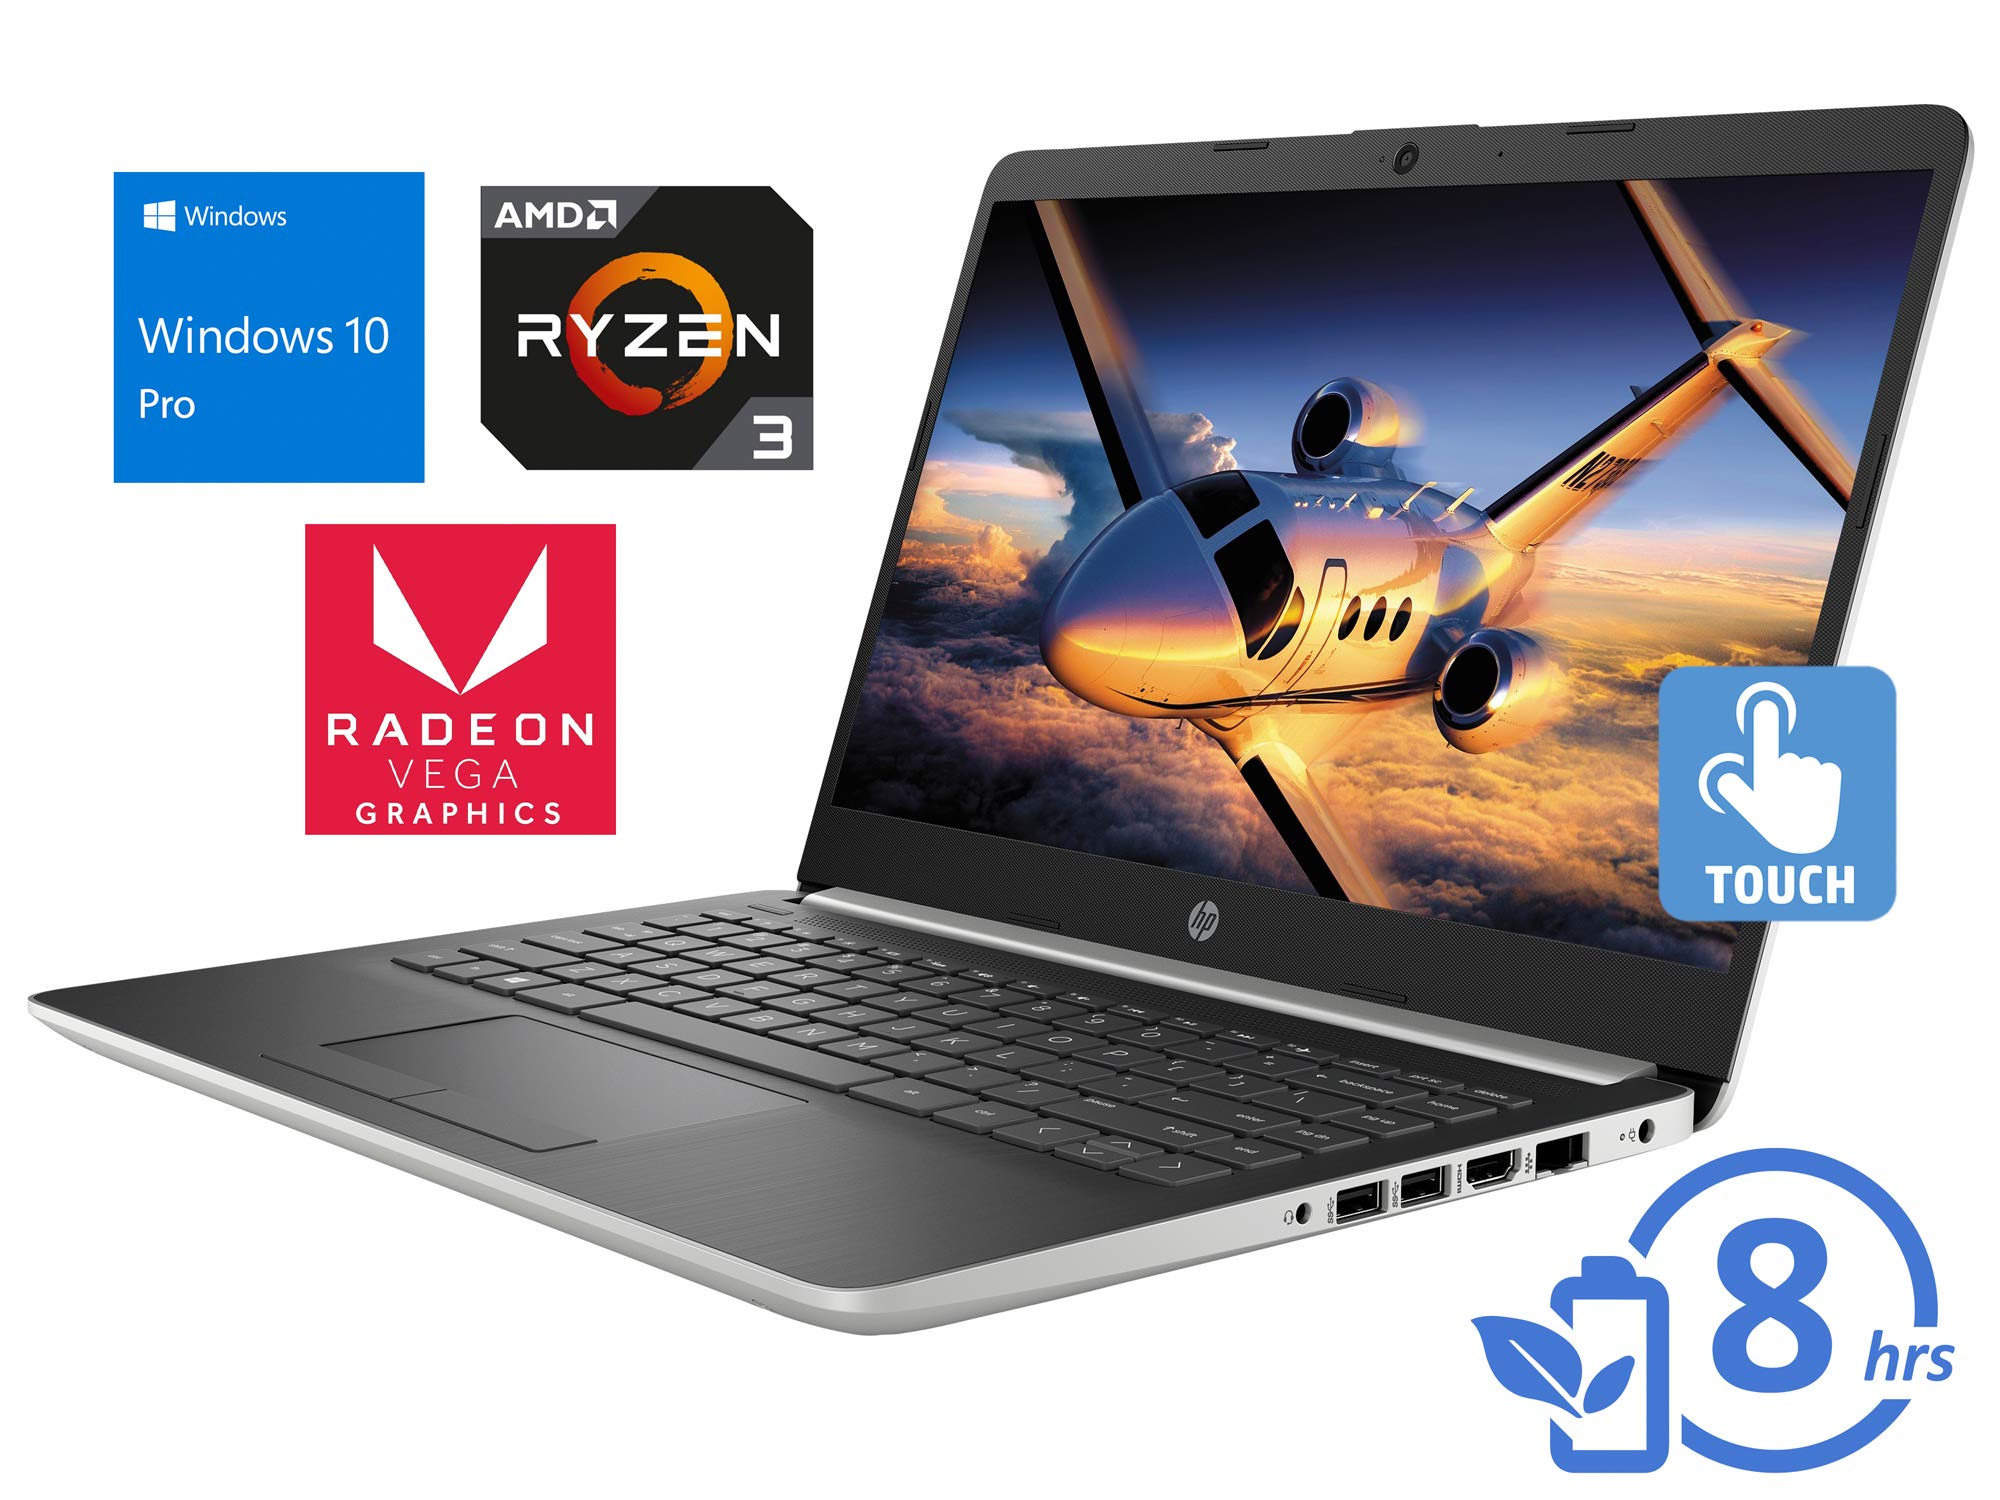 "HP 14 Laptop, 14"" HD Touch Display, AMD Ryzen 3 3200U Upto 3.5GHz, 16GB RAM, 256GB SSD, Vega 3, HDMI, Card Reader, Wi-Fi, Bluetooth, Windows 10 Pro"